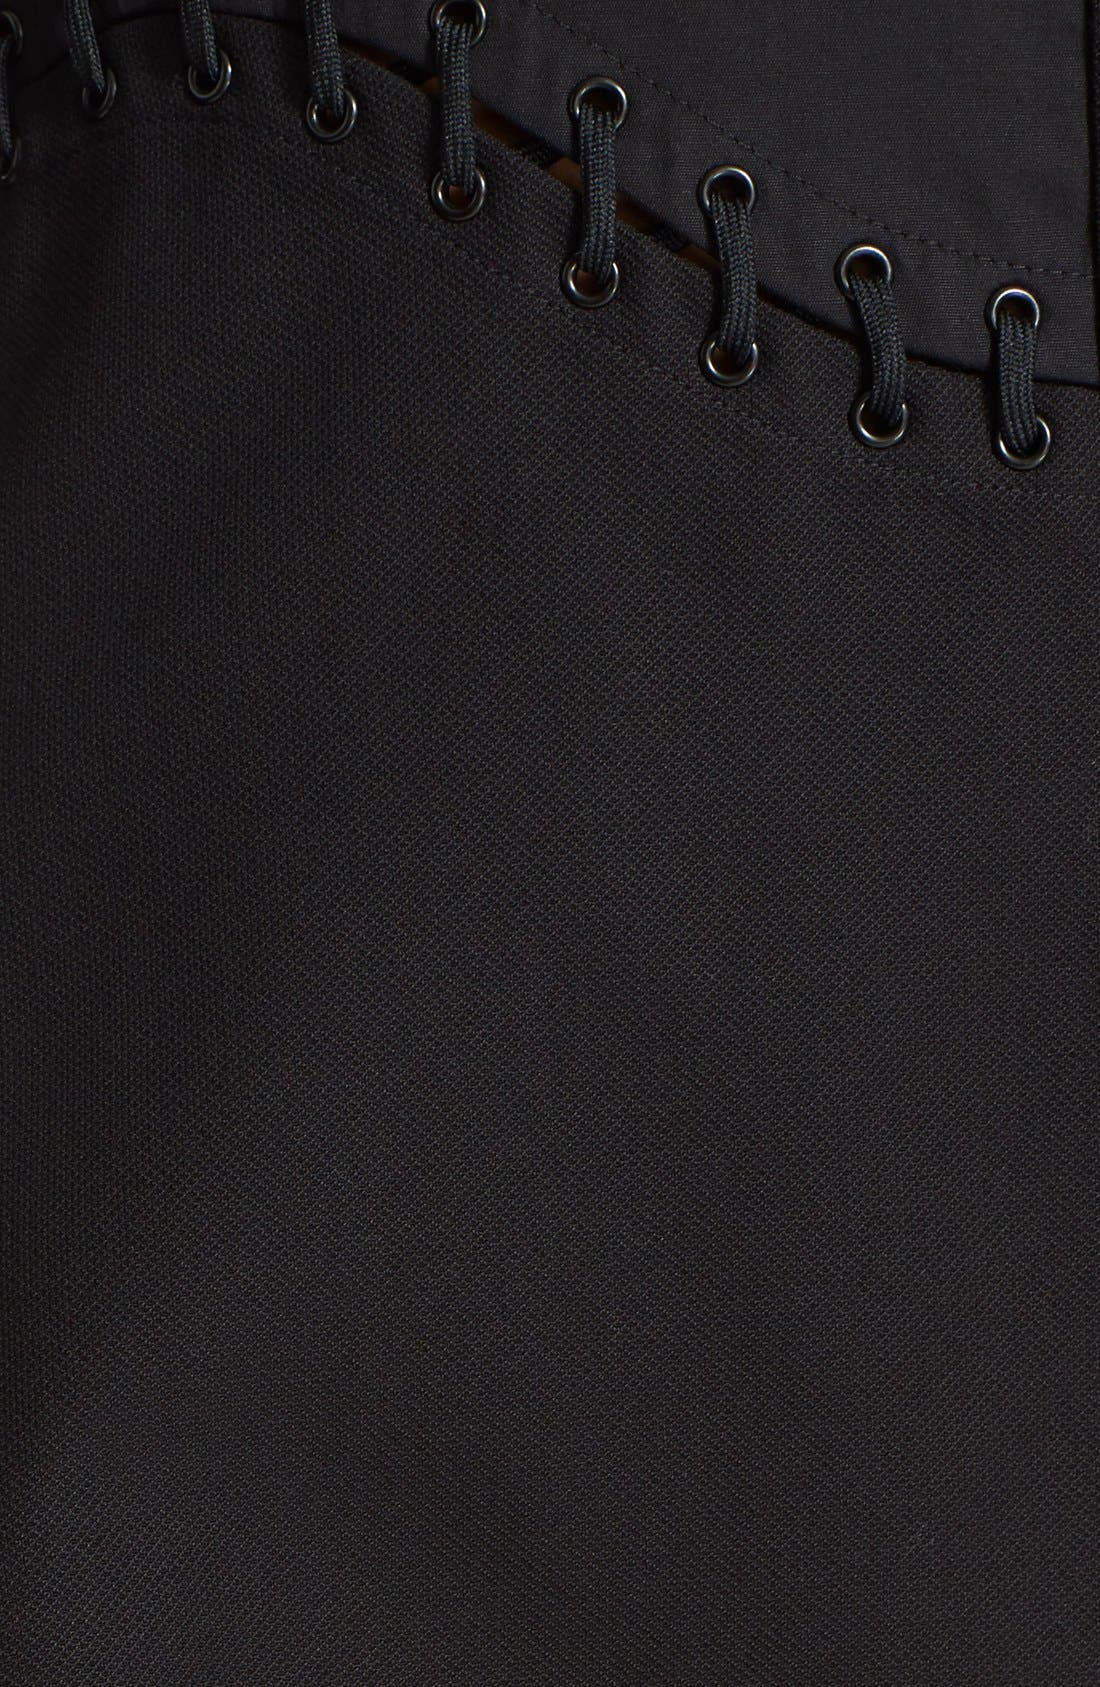 Alternate Image 3  - Alexander Wang Lace Detail Fit & Flare Shirtdress